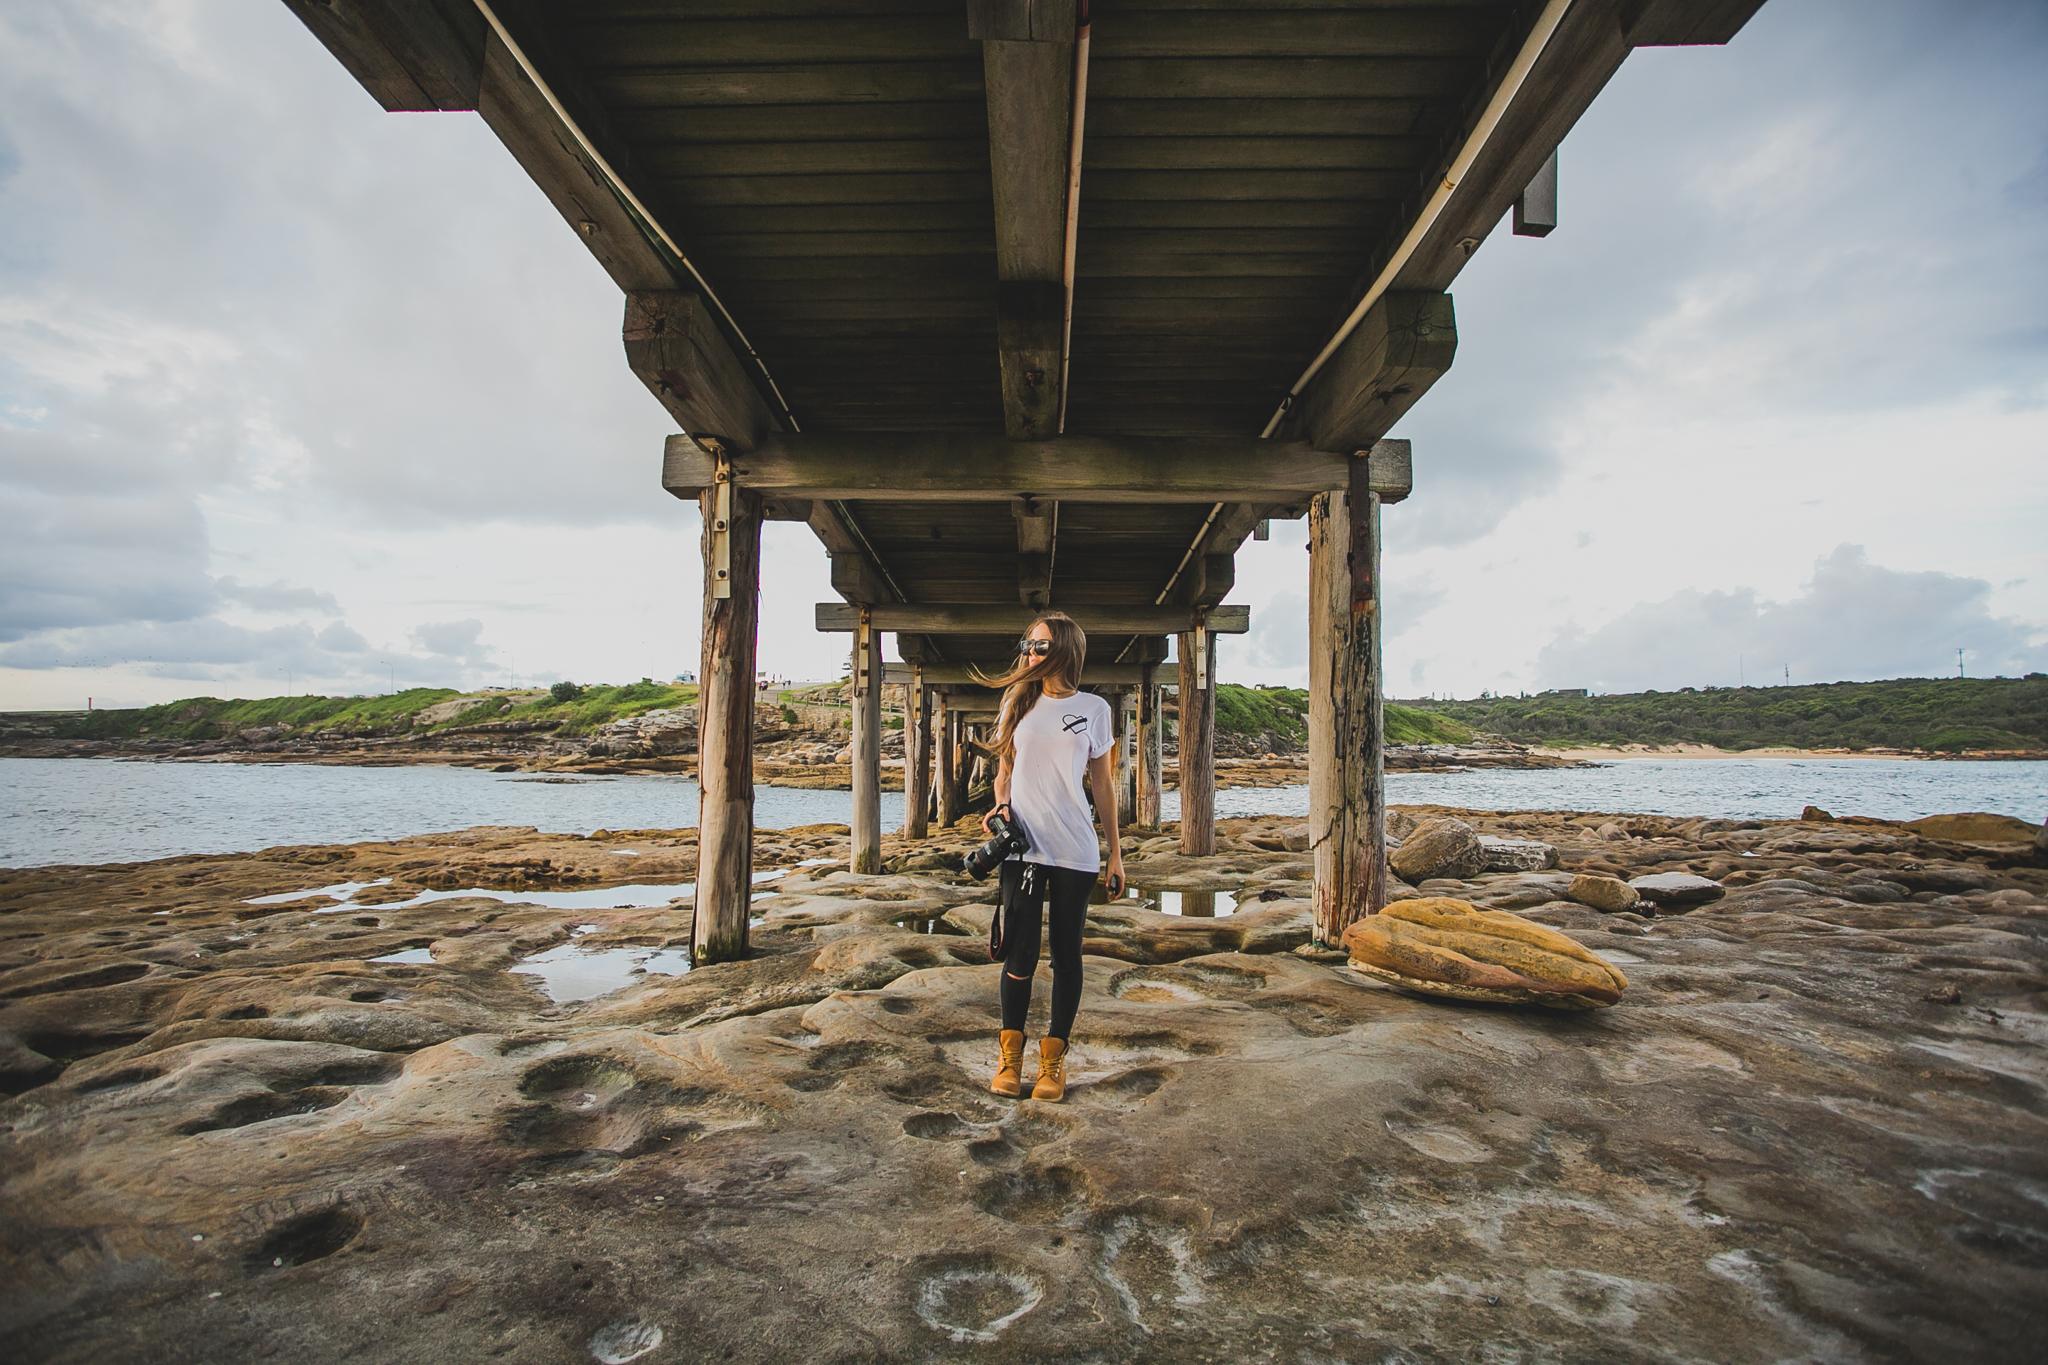 Under the bridge at Bare Island - Photo by Gus Medero